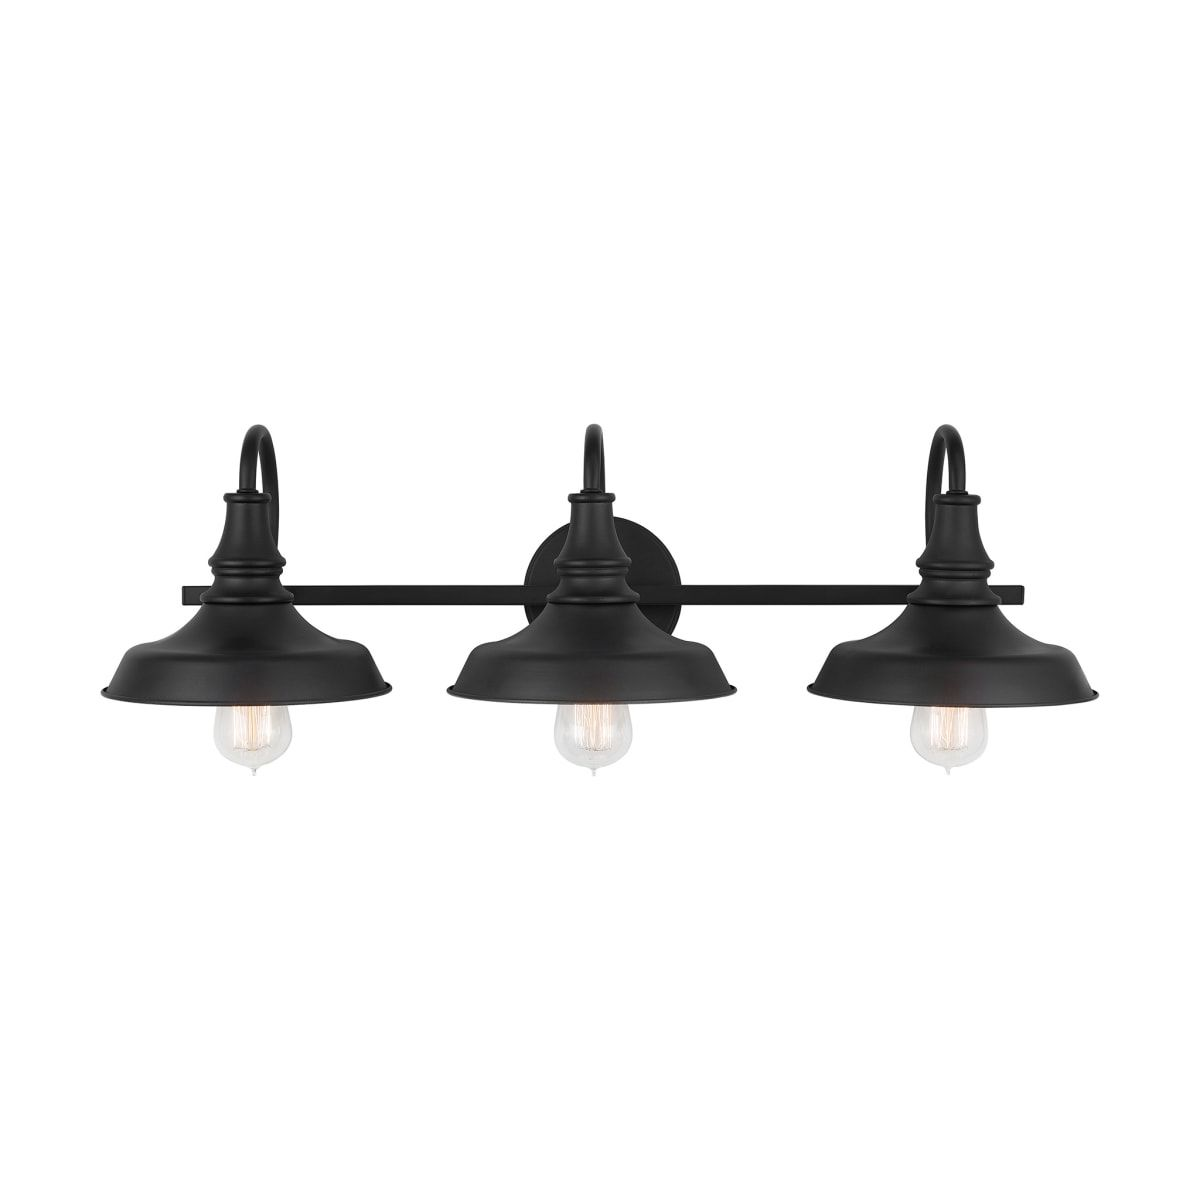 "Photo of Bellevue CA9D302A-OB Old Bronze 3 Light 29 ""Wide Bathroom Basin Light – LightingDirect.com"